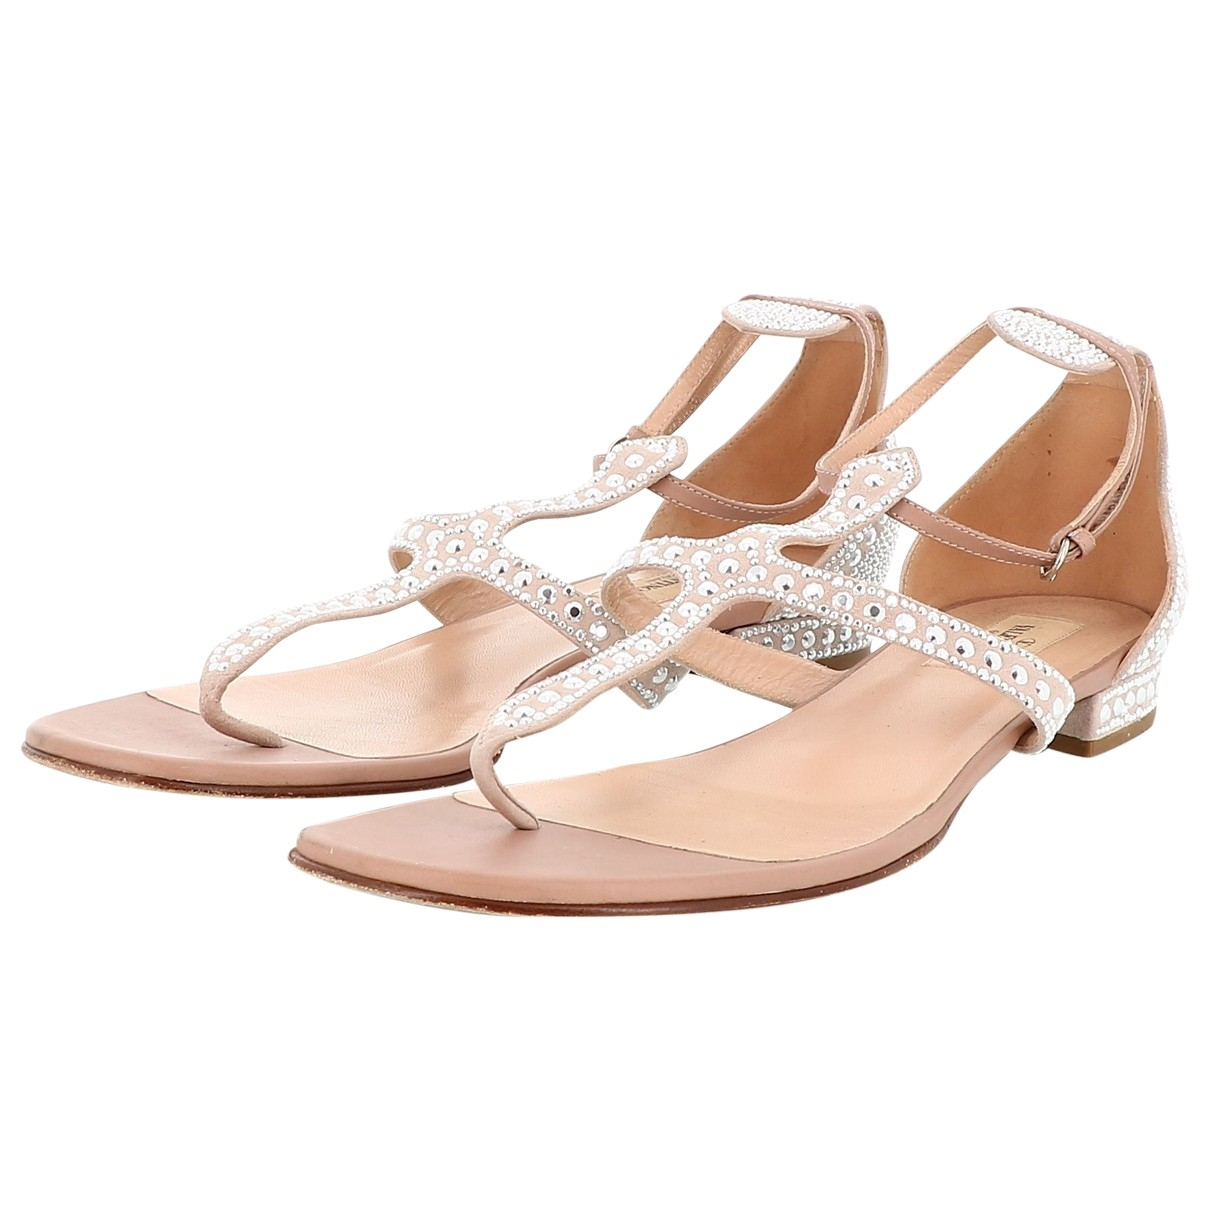 Valentino Garavani \N Silver Leather Sandals for Women 41 EU